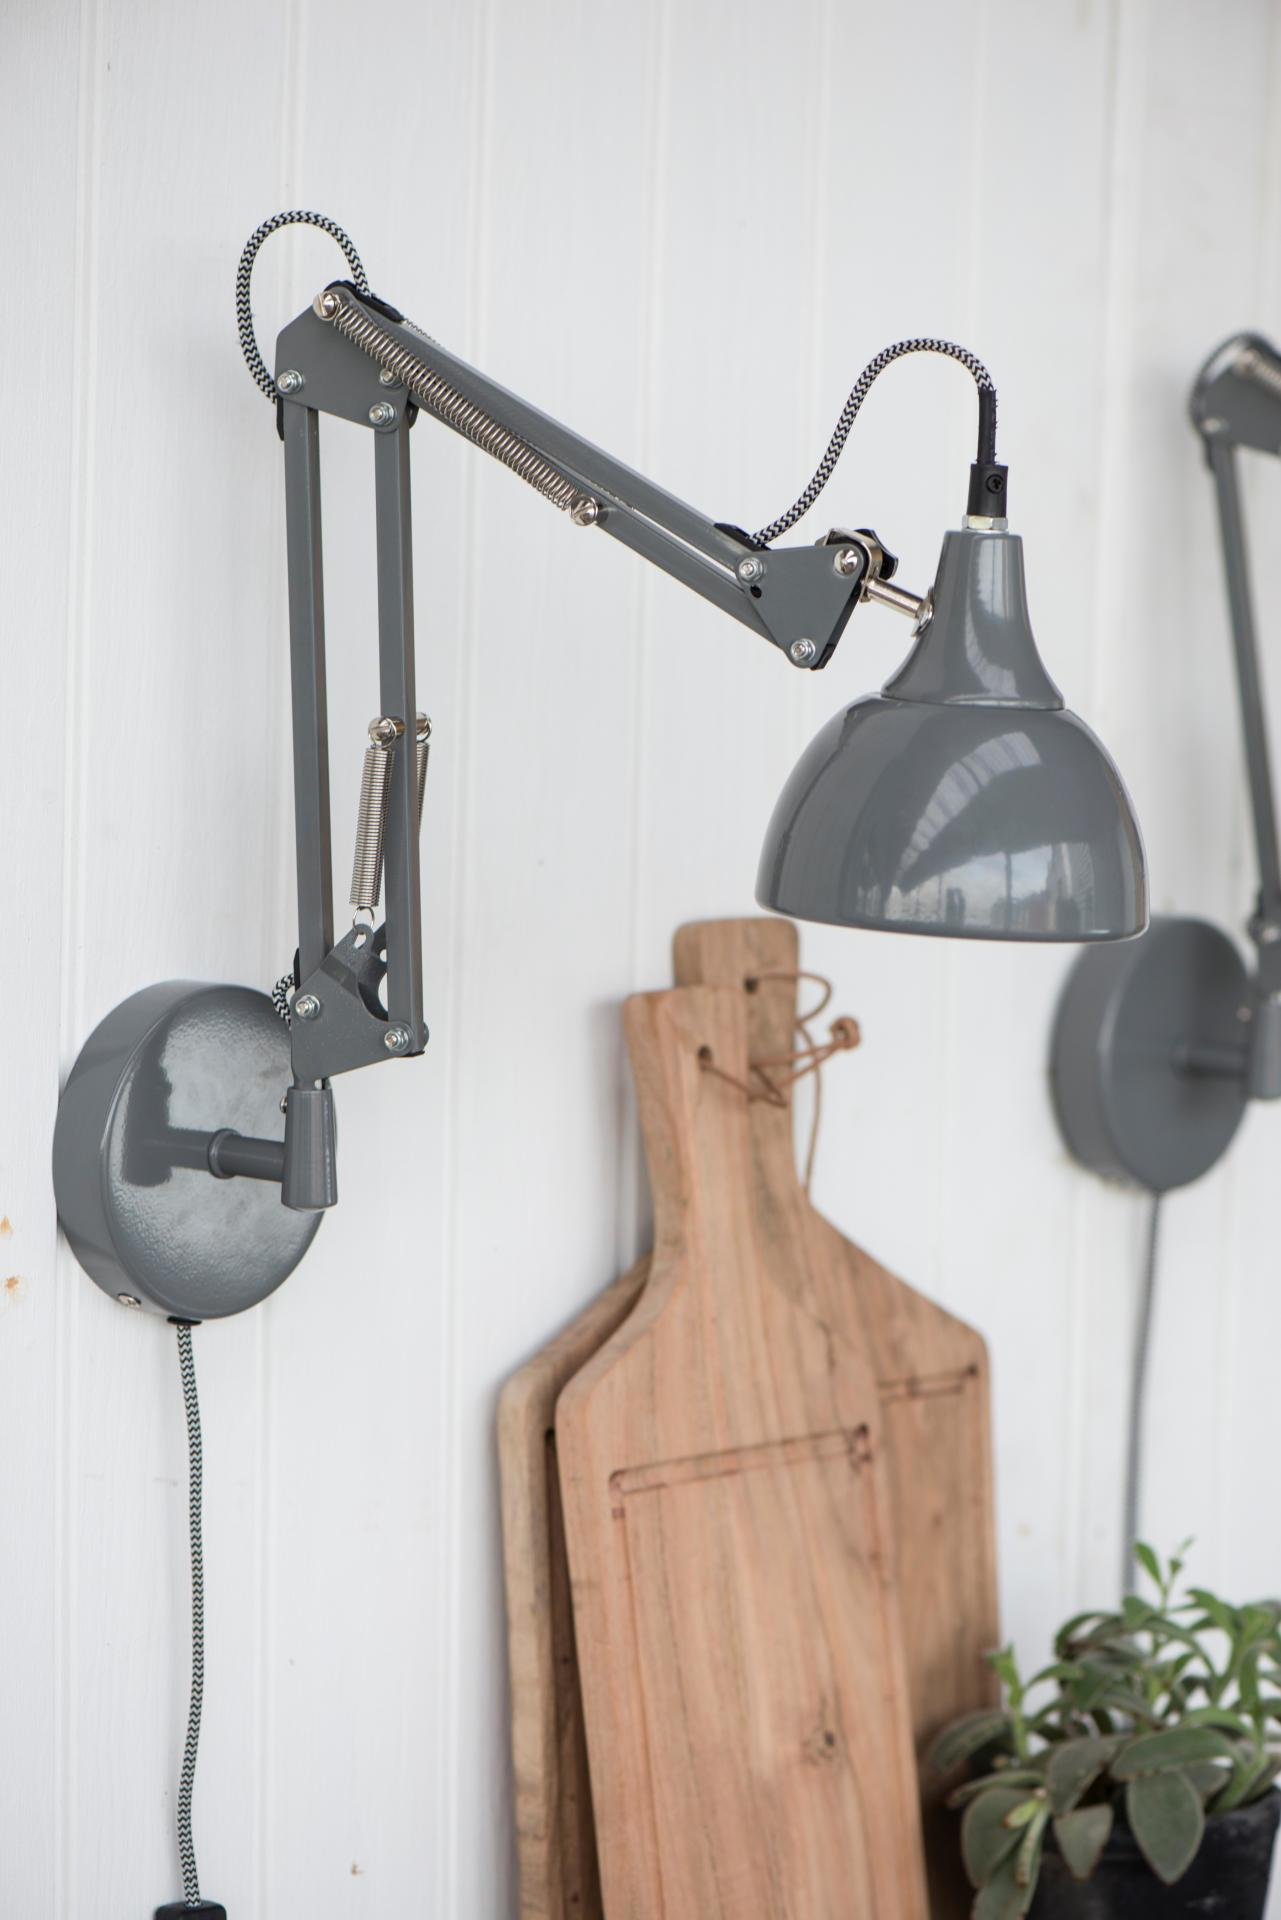 IB LAURSEN Nástěnná lampa Architect Model, šedá barva, kov